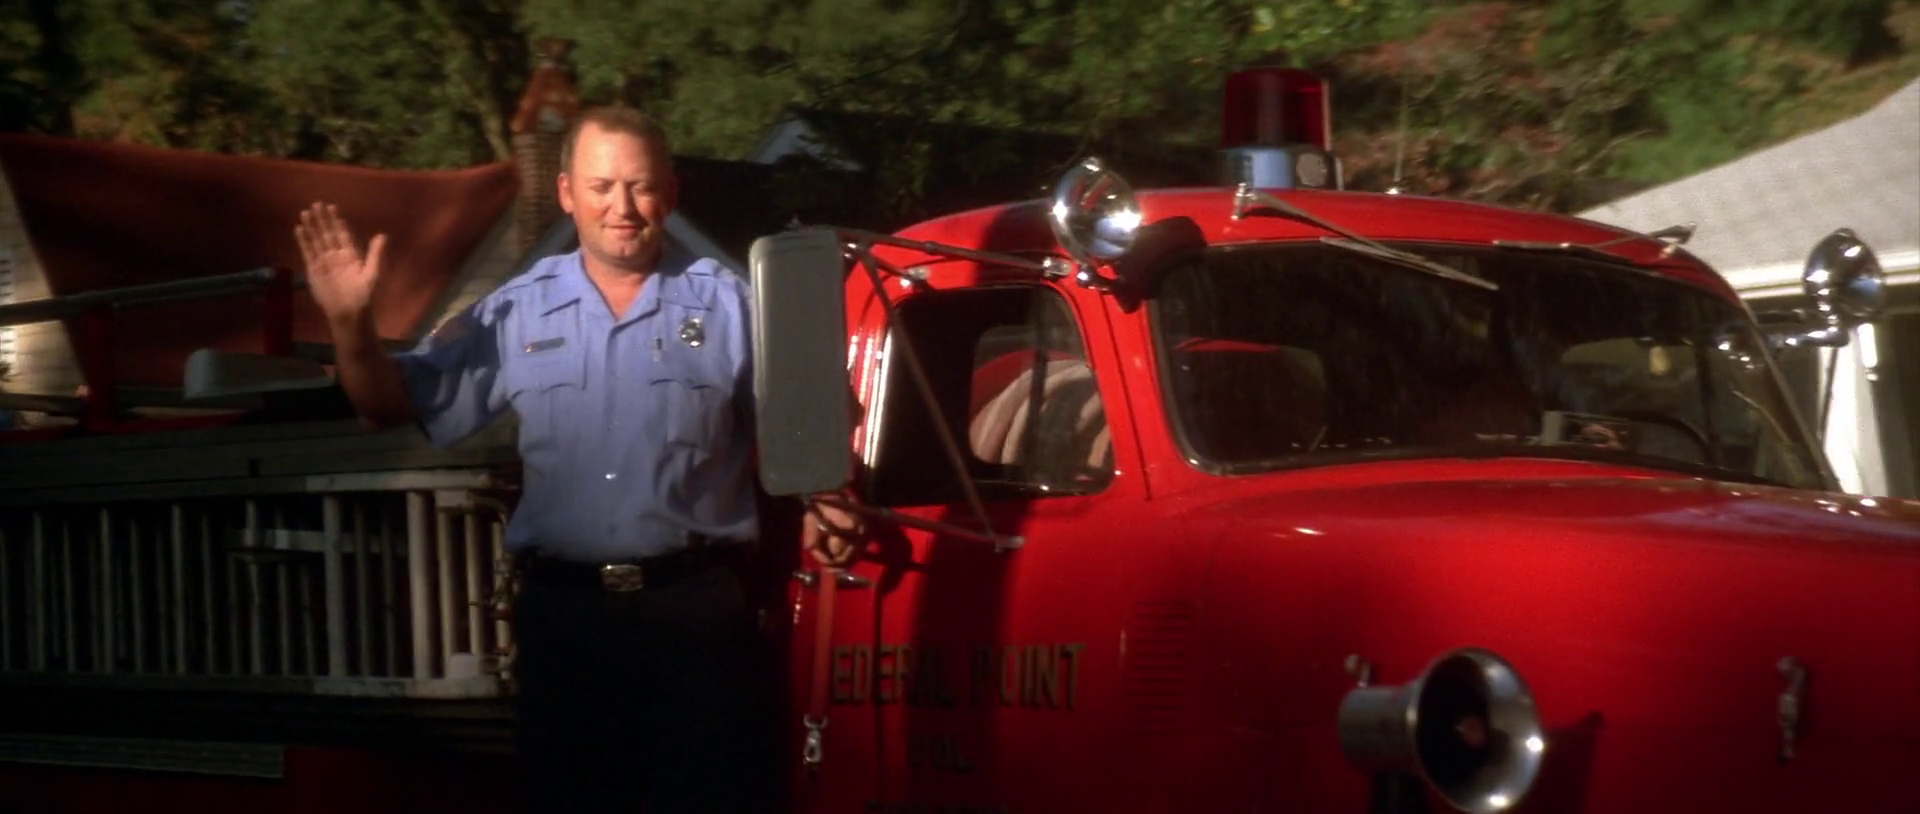 Risultati immagini per blue velvet fireman